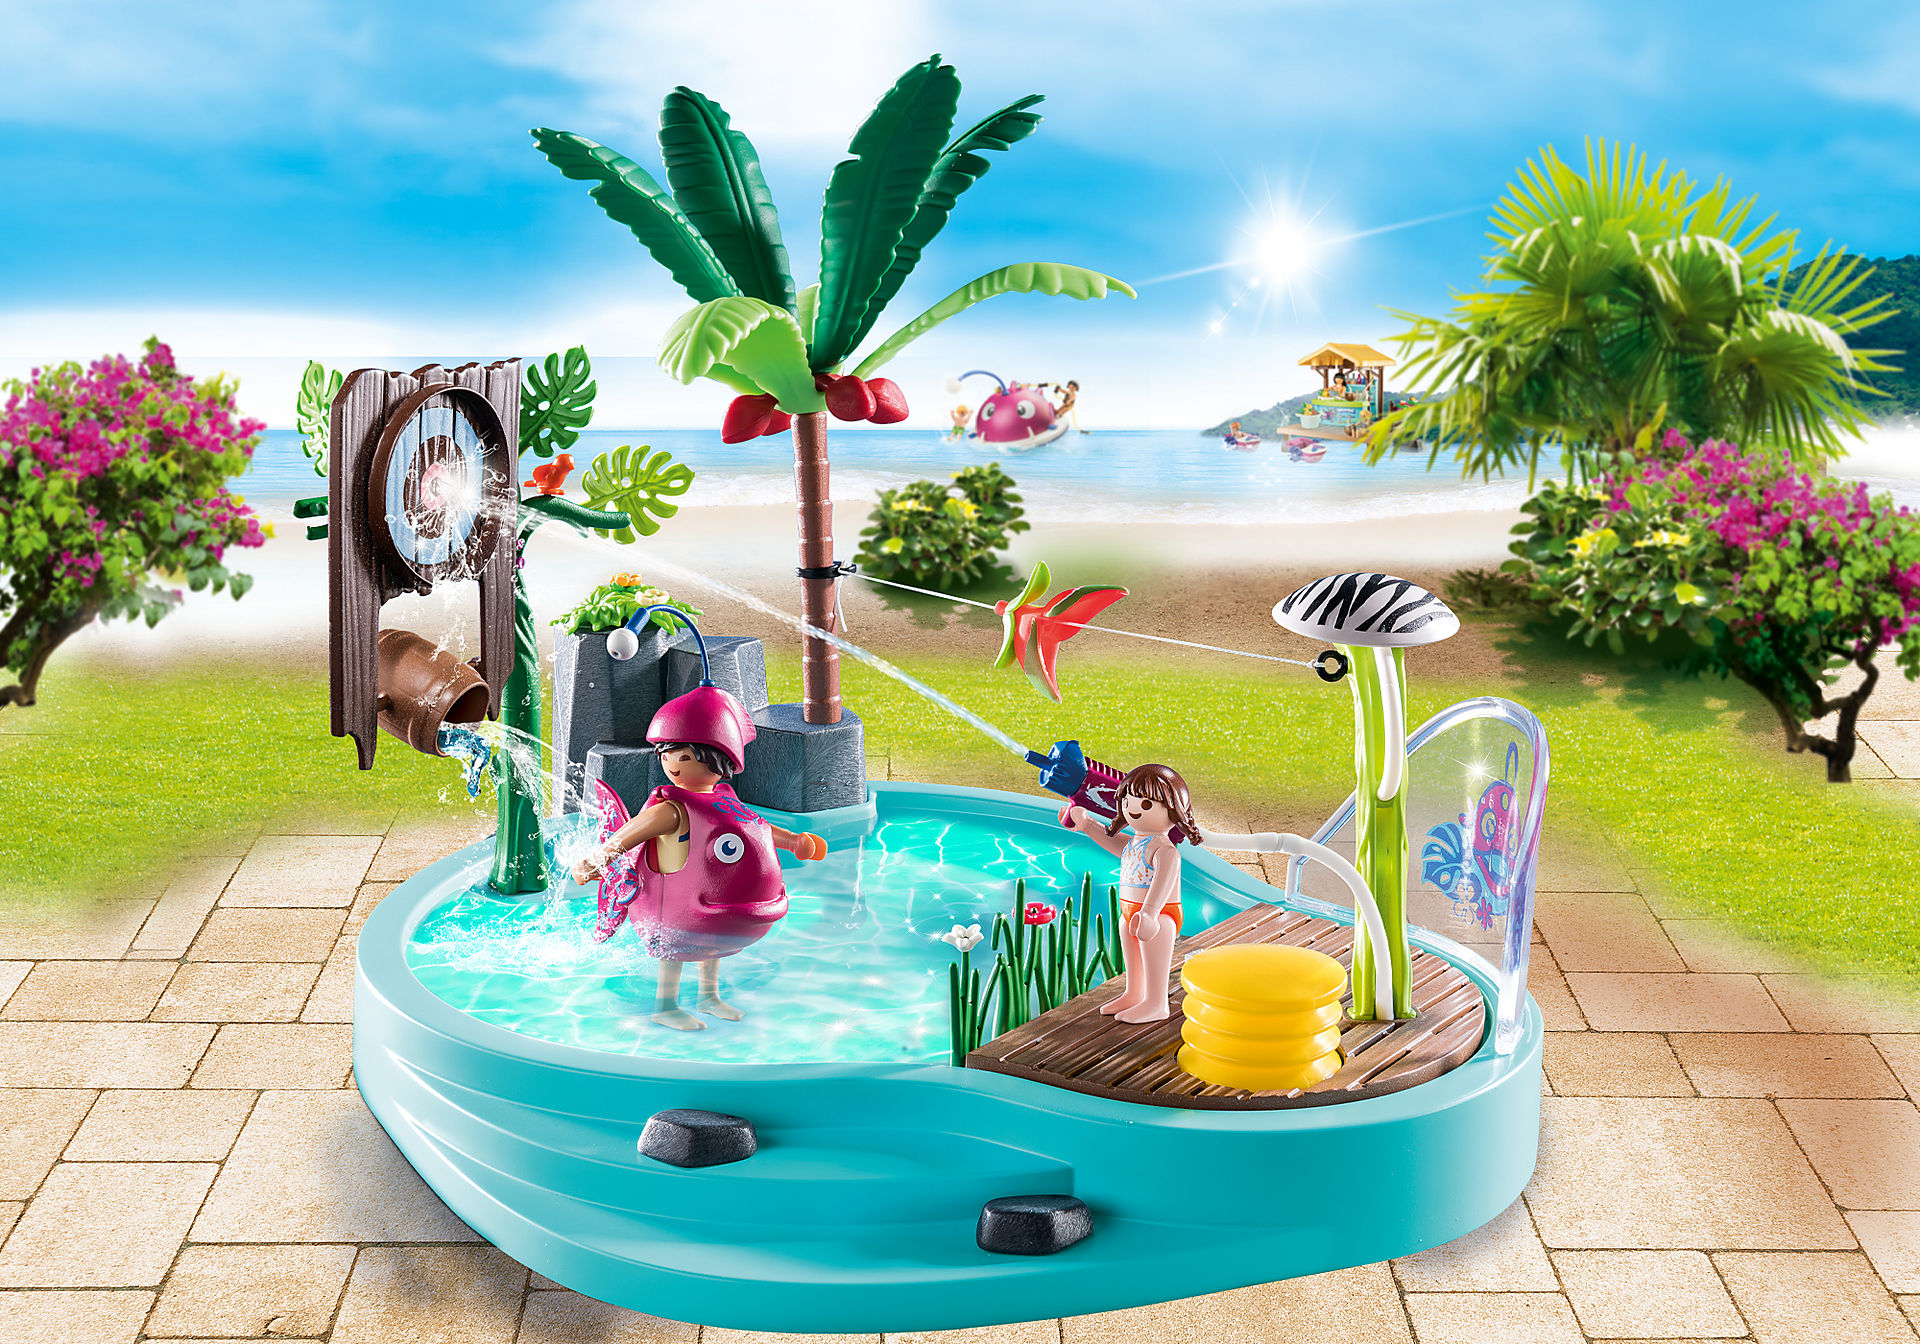 70610 Sjov pool med vandpistol zoom image1